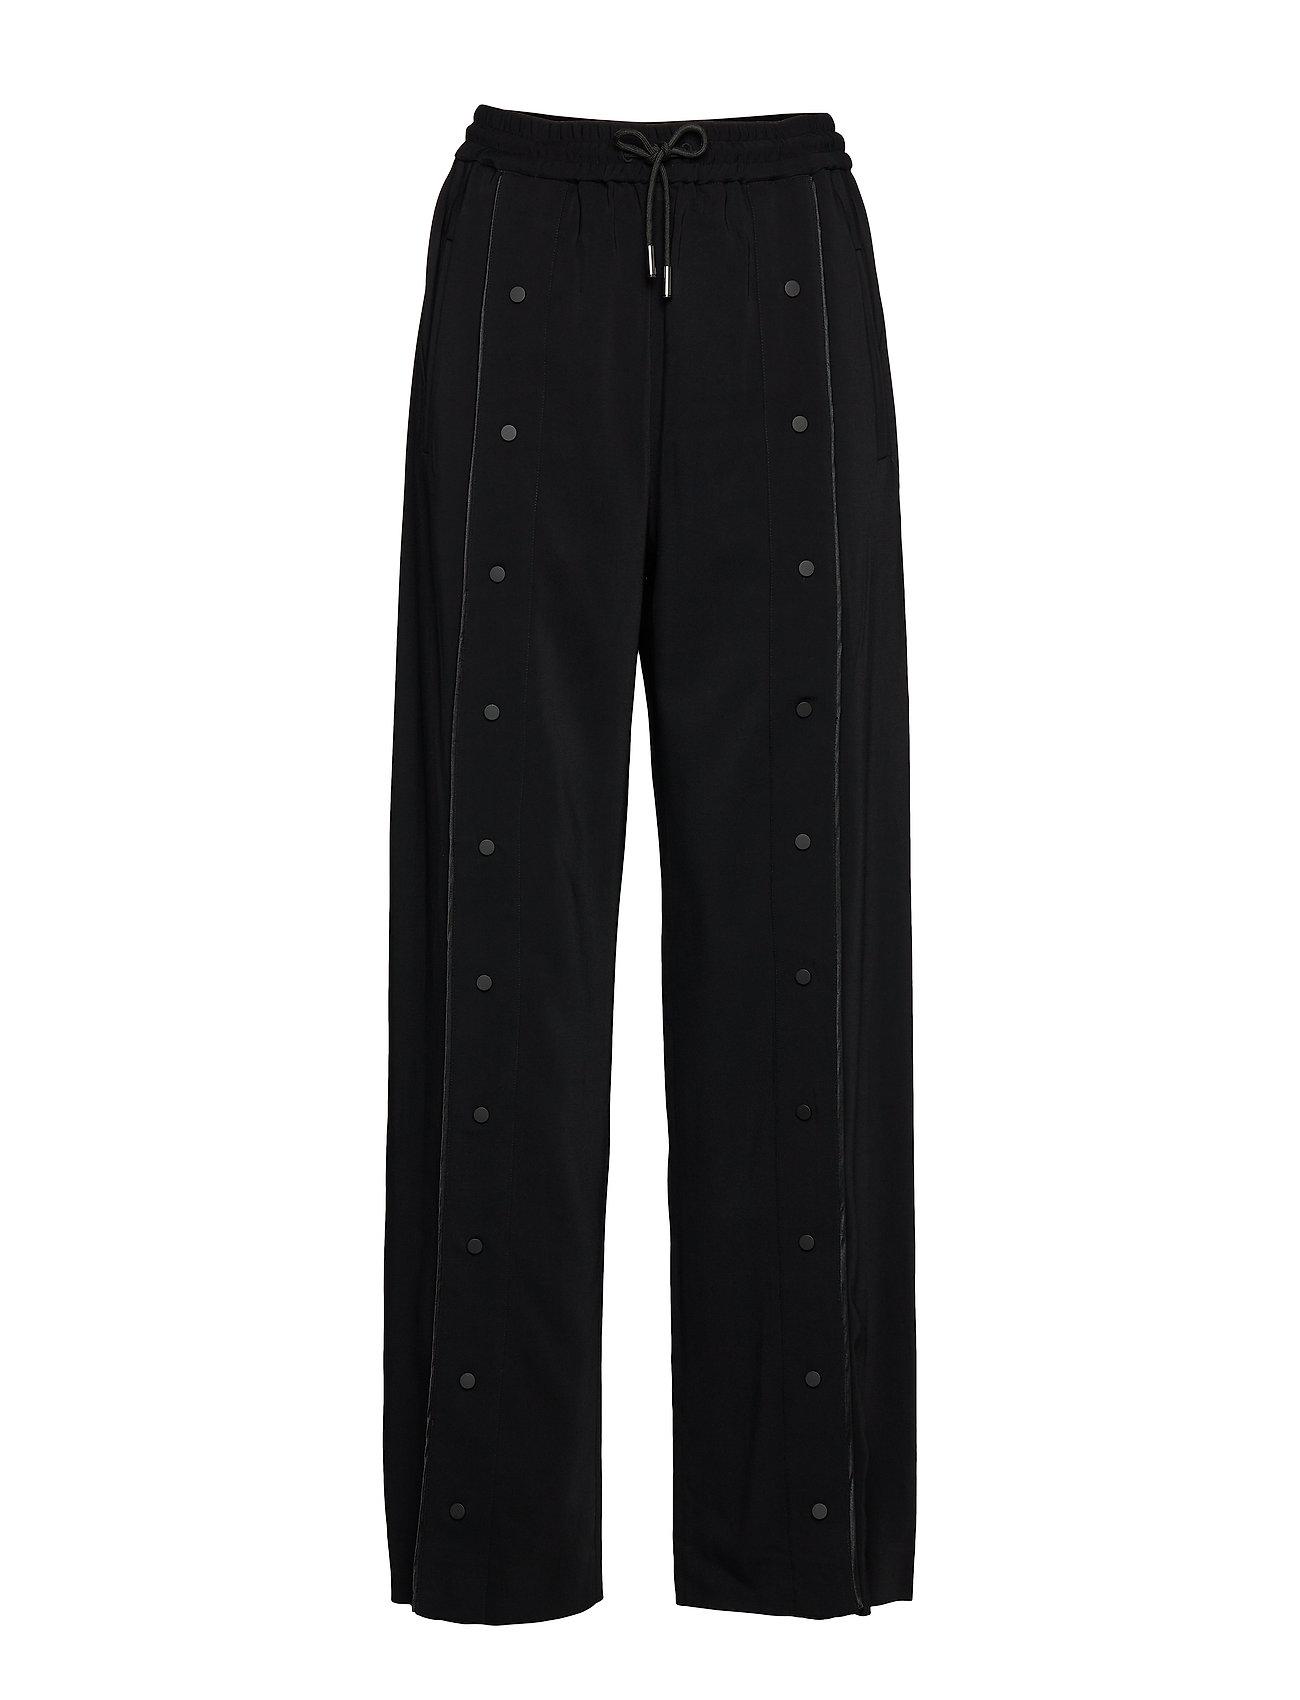 Image of Wide Leg Snap Pants W/ Logo Vide Bukser Sort Karl Lagerfeld (3406203685)